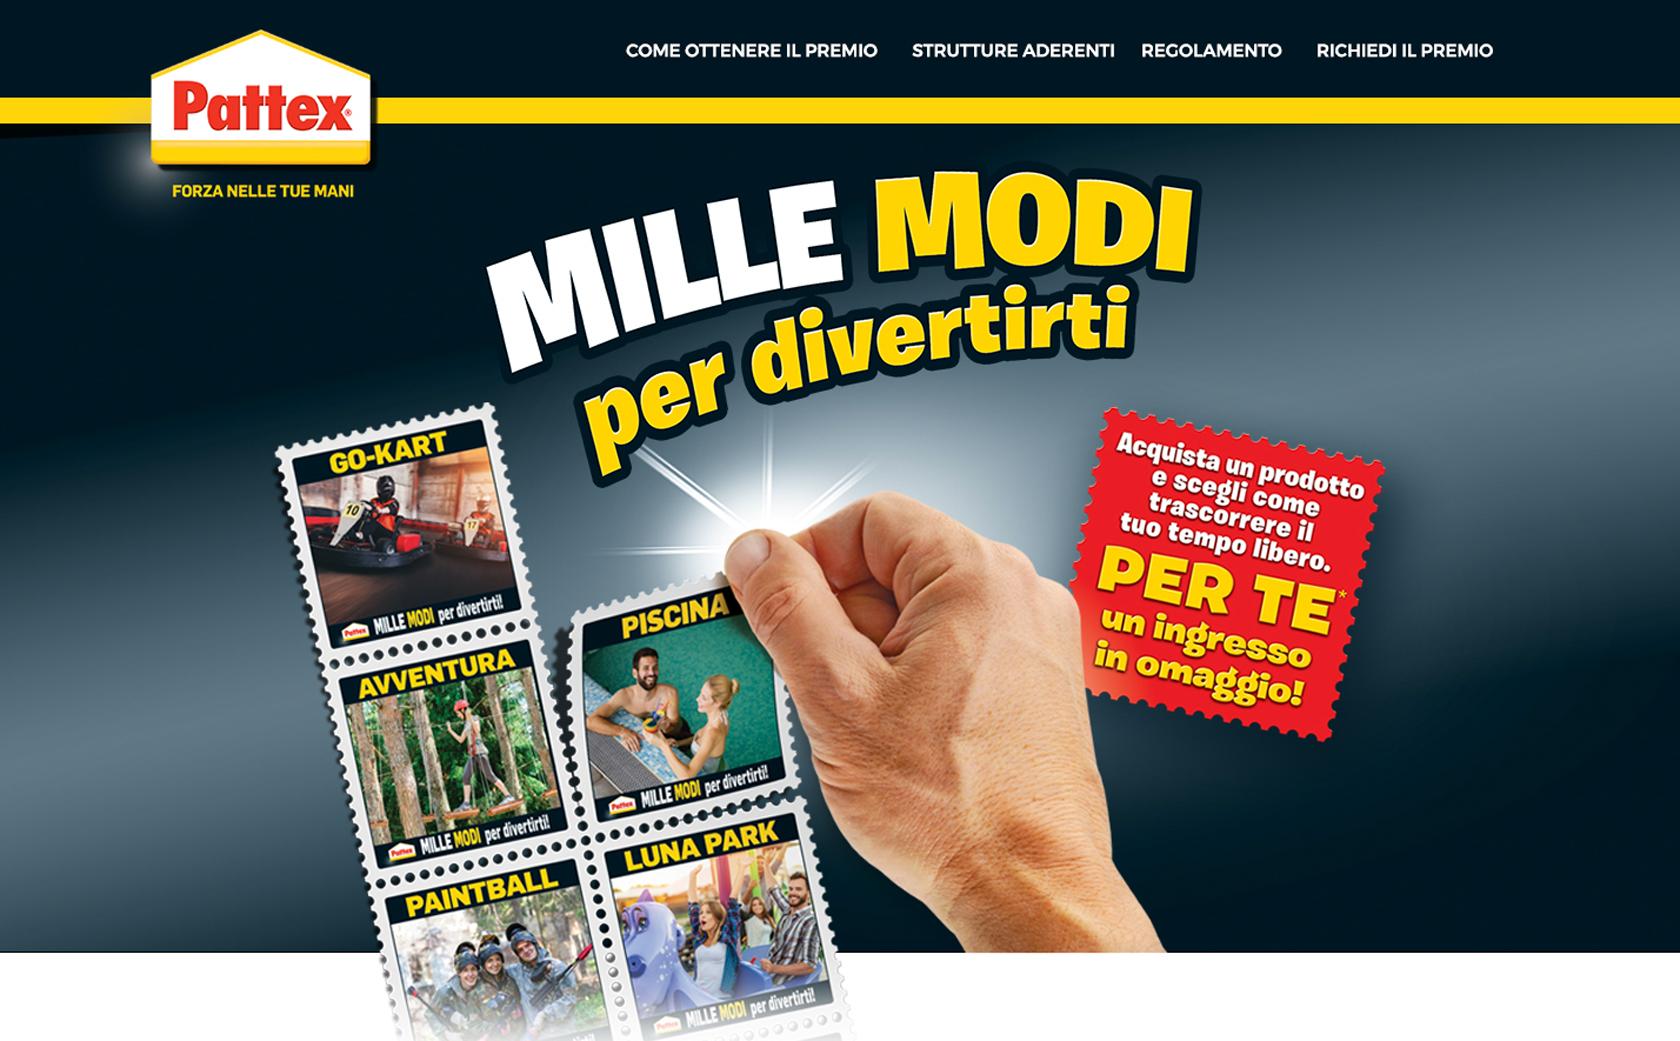 https://www.promotionmagazine.it/wp/wp-content/uploads/2017/07/Pattex-Mille-modi-per-divertirti-1680.jpg